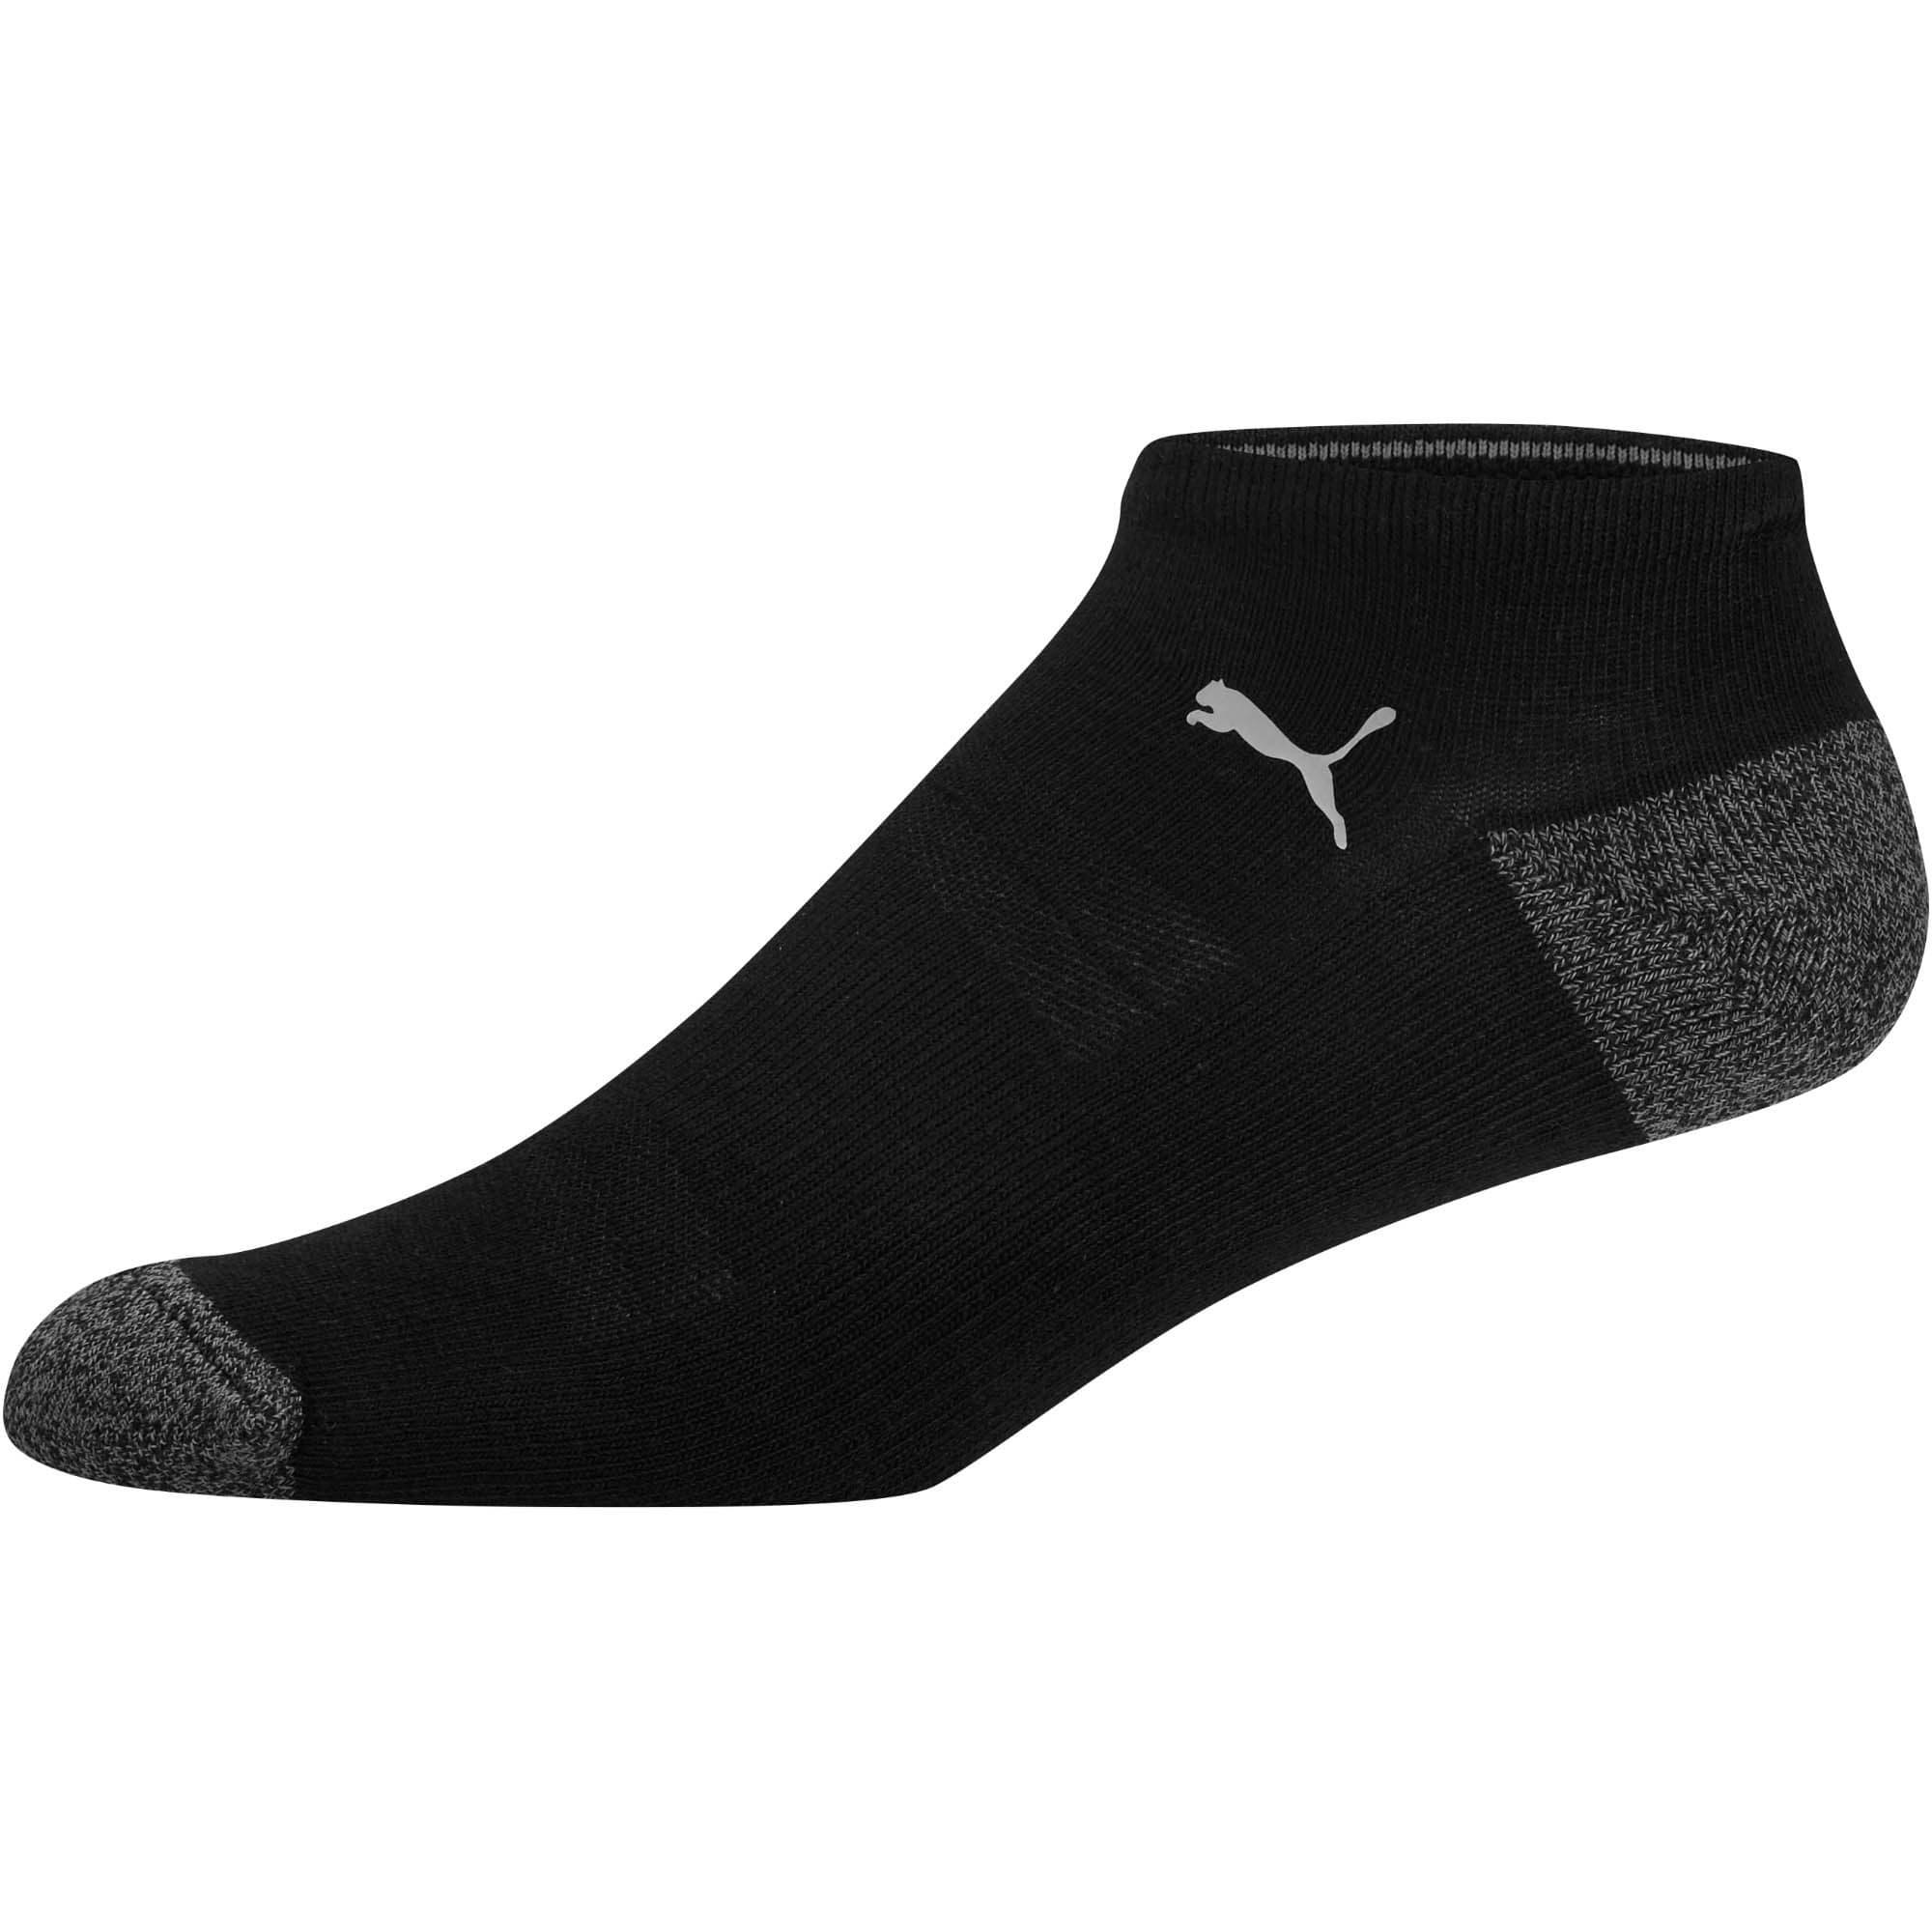 Thumbnail 2 of 1/2 Terry Men's No Show Socks [3 Pack], BLACK / GREY, medium